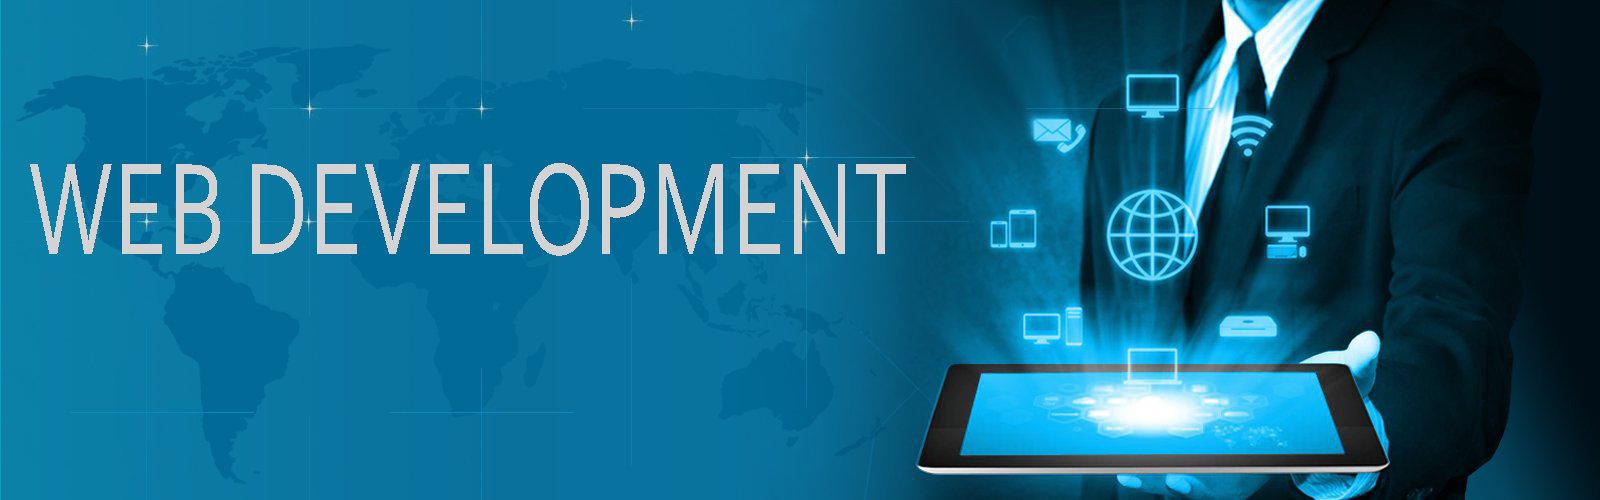 web-development-services-company